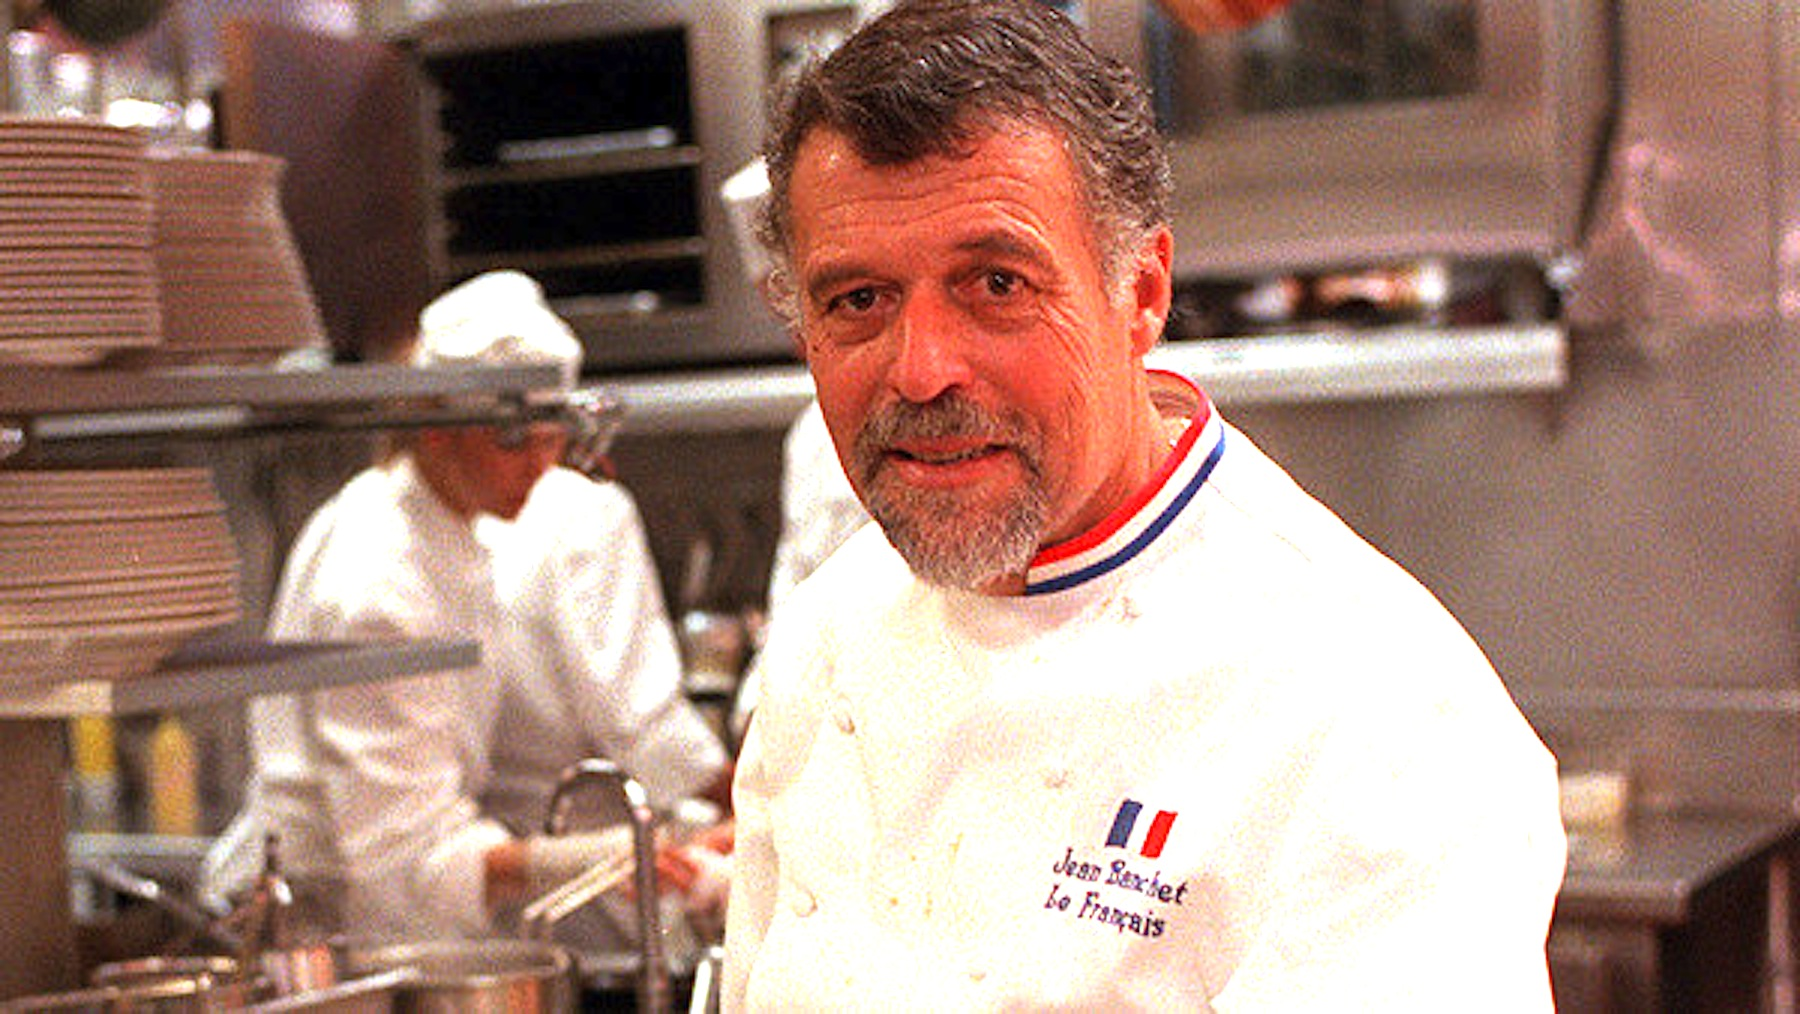 Chef Jean Banchet